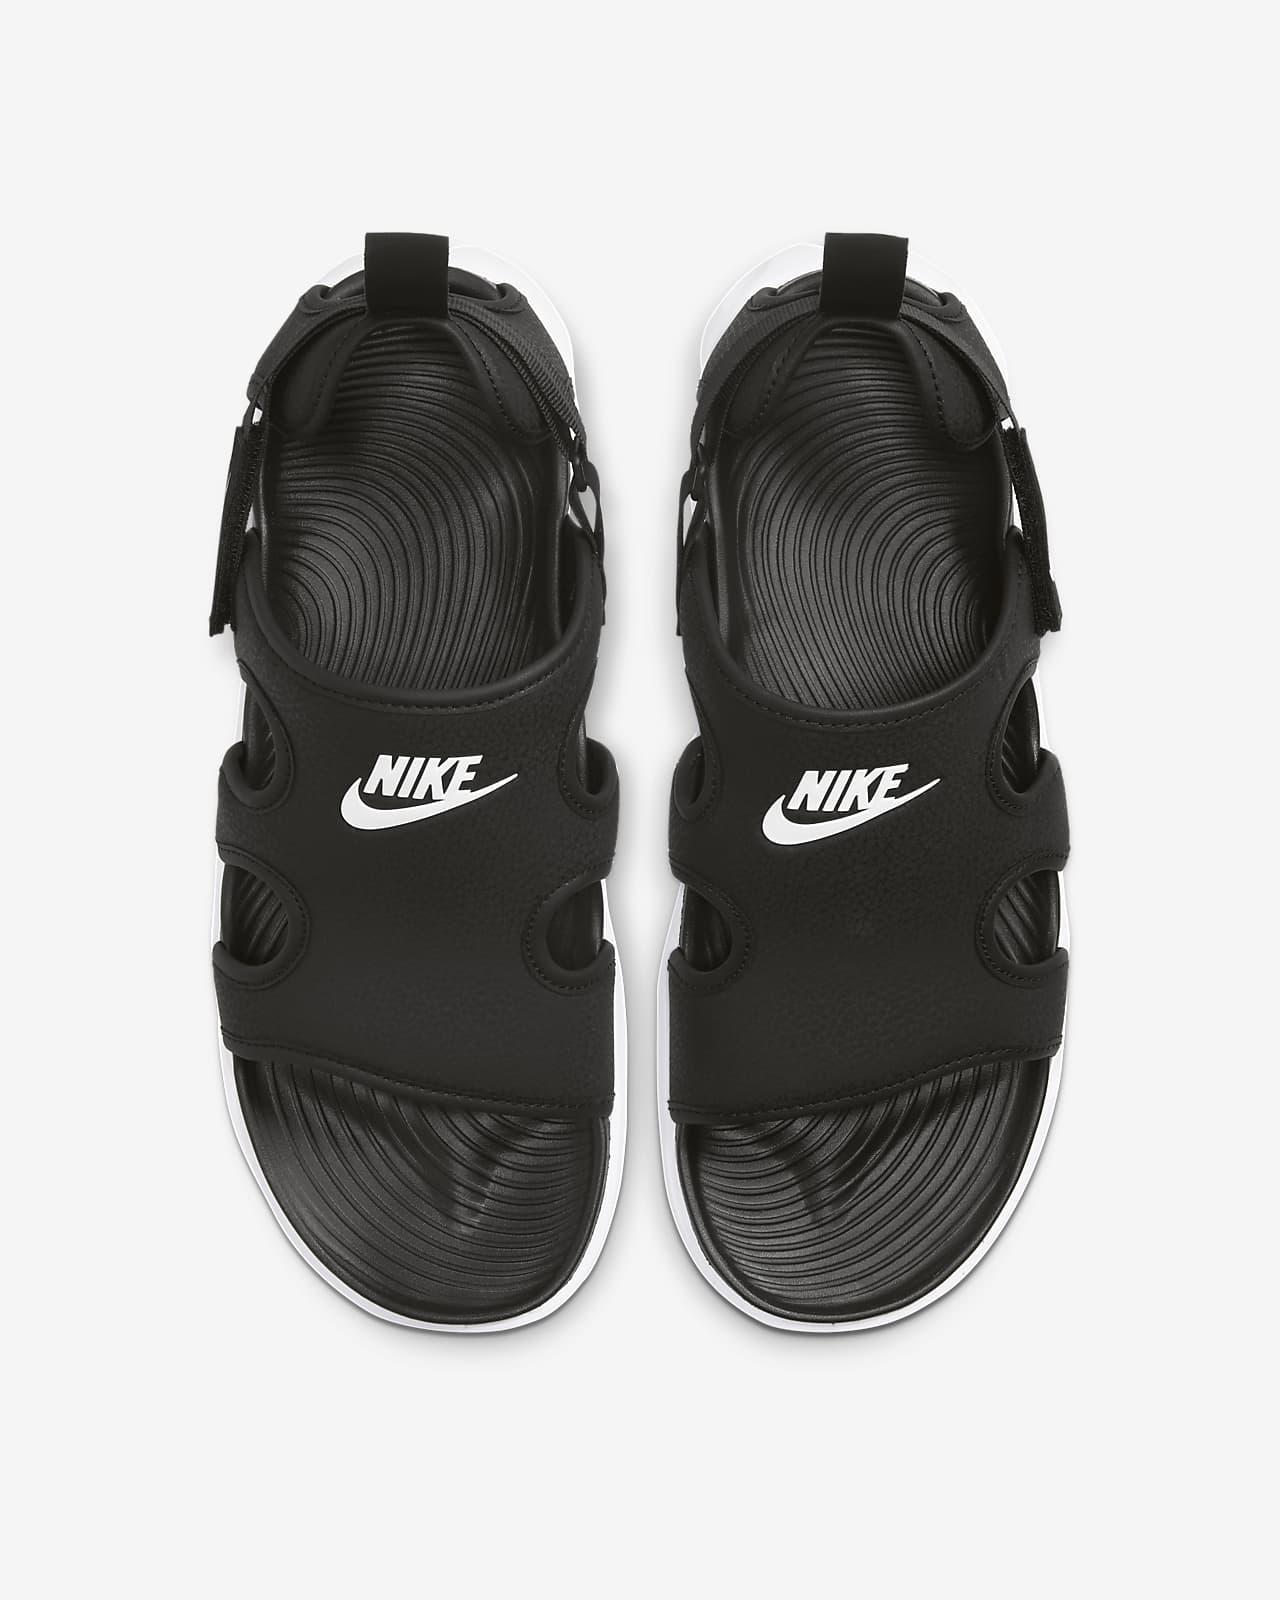 mens nike sandals on sale